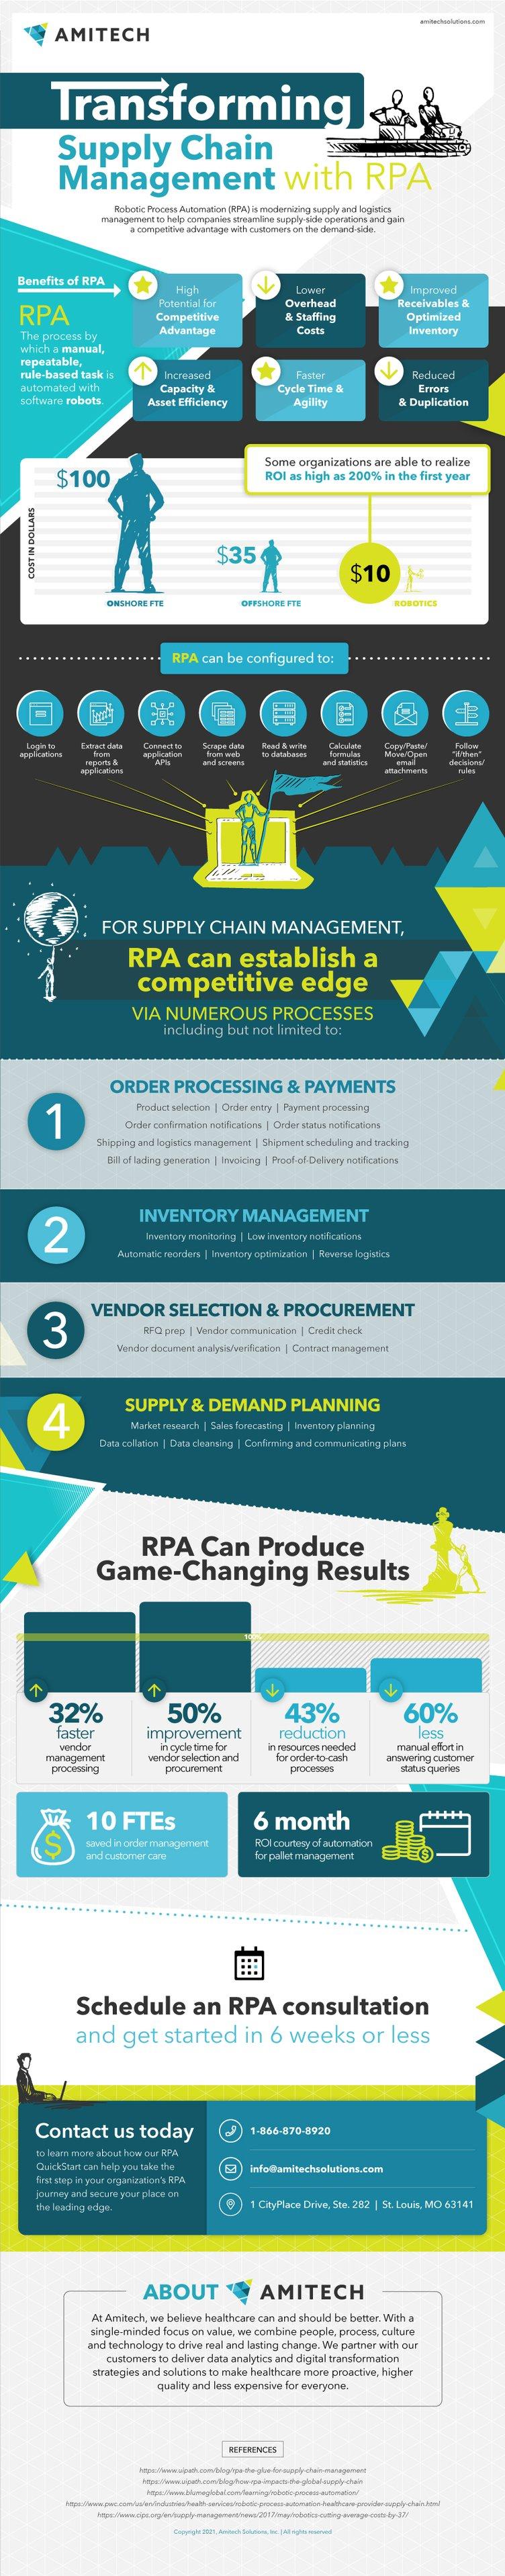 Amitech_RPA_SupplyChain_Infographic